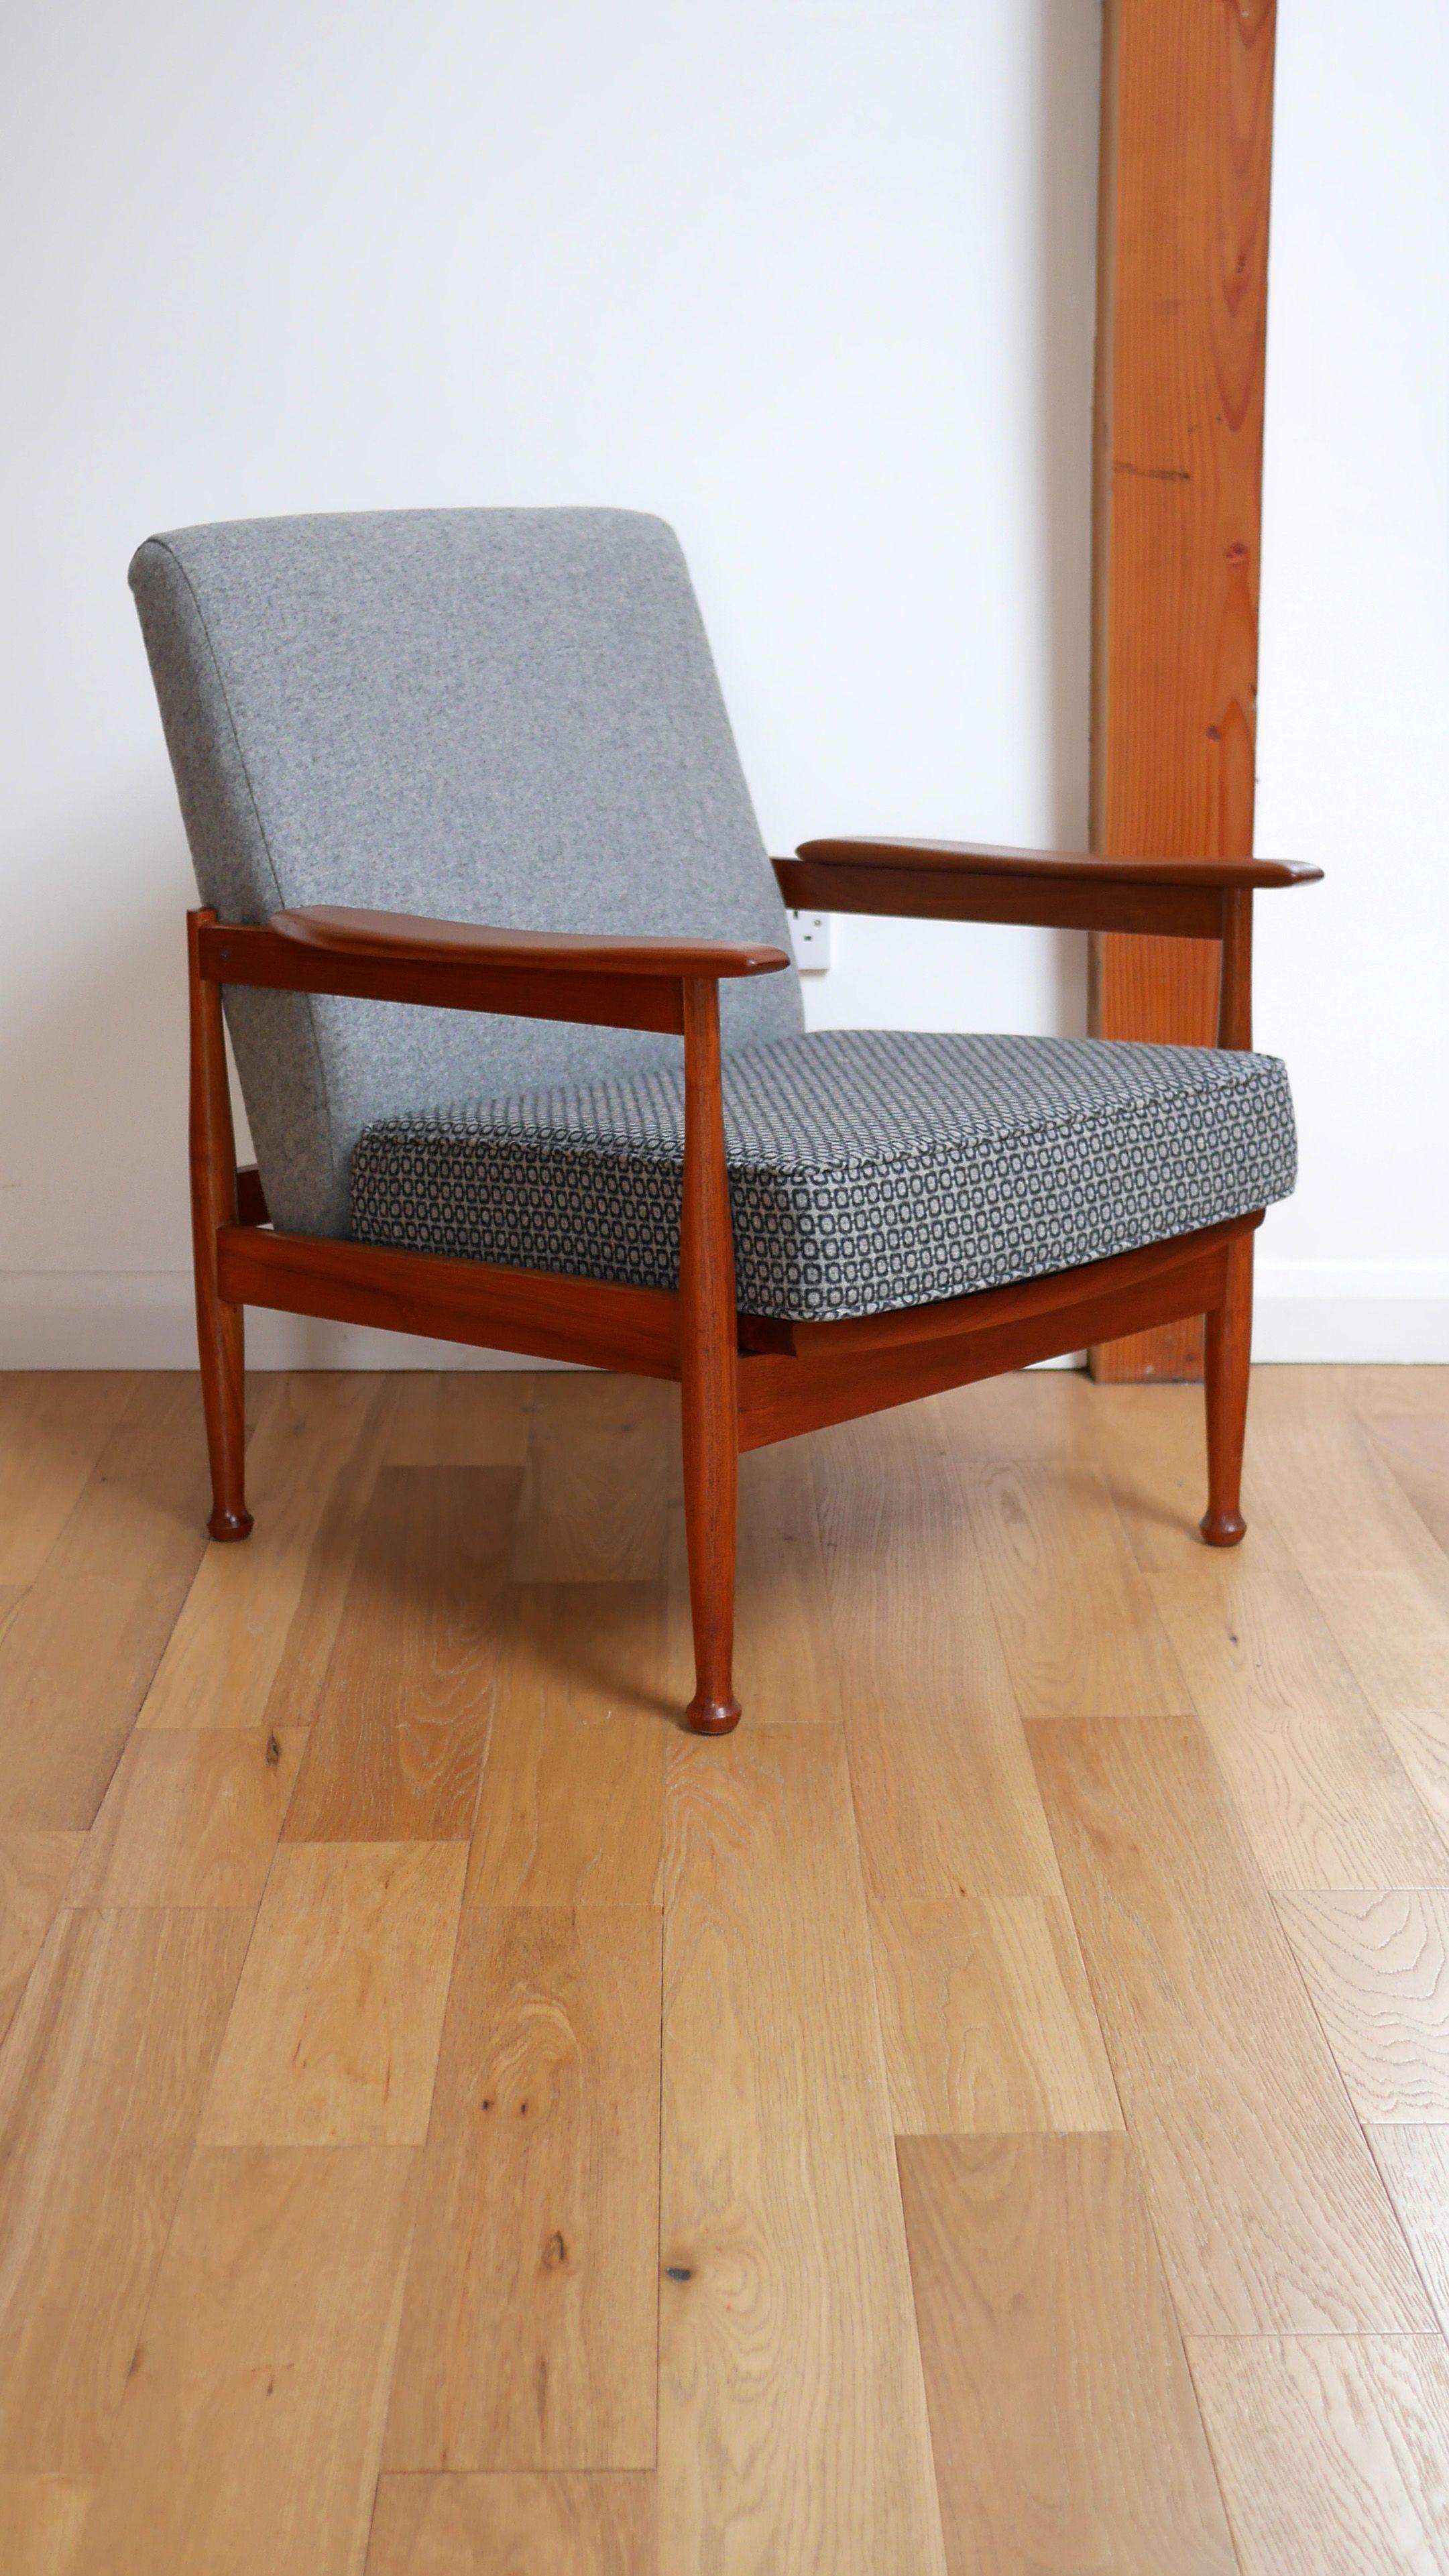 Prime Guy Rogers Manhattan Teak Reclining Armchair C 1962 Machost Co Dining Chair Design Ideas Machostcouk